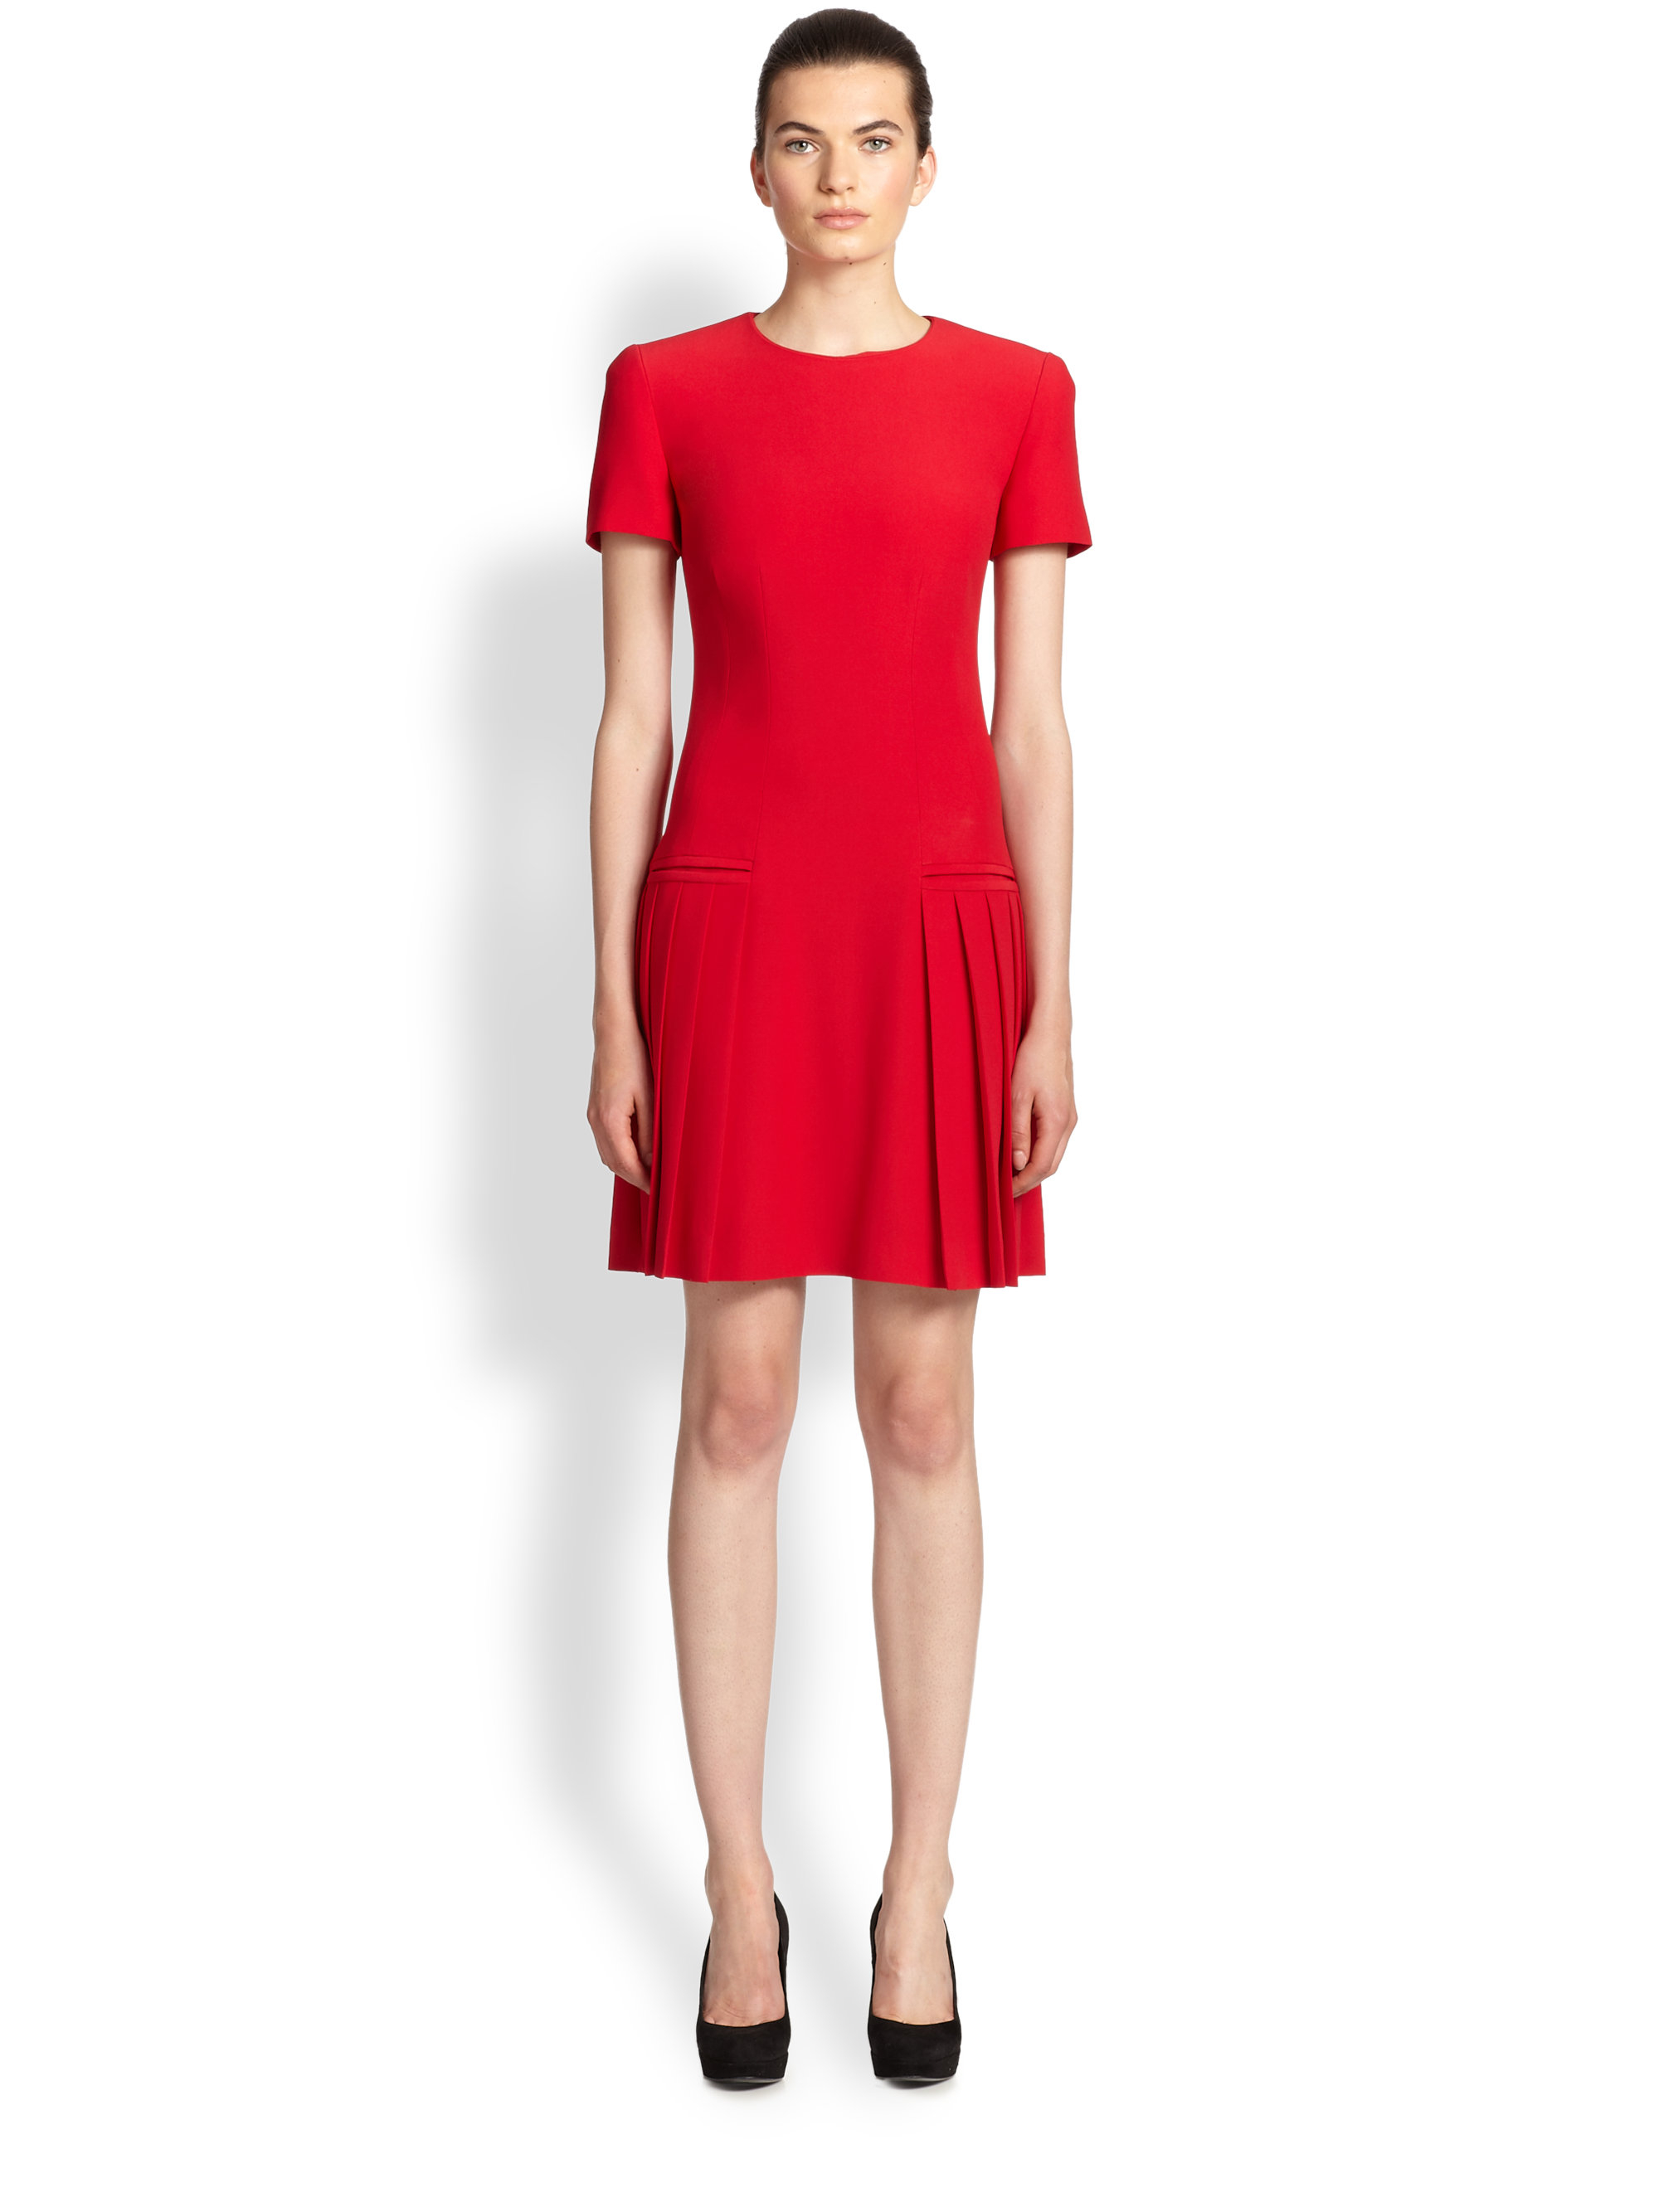 Alexander mcqueen Pleated Dress in Red | Lyst